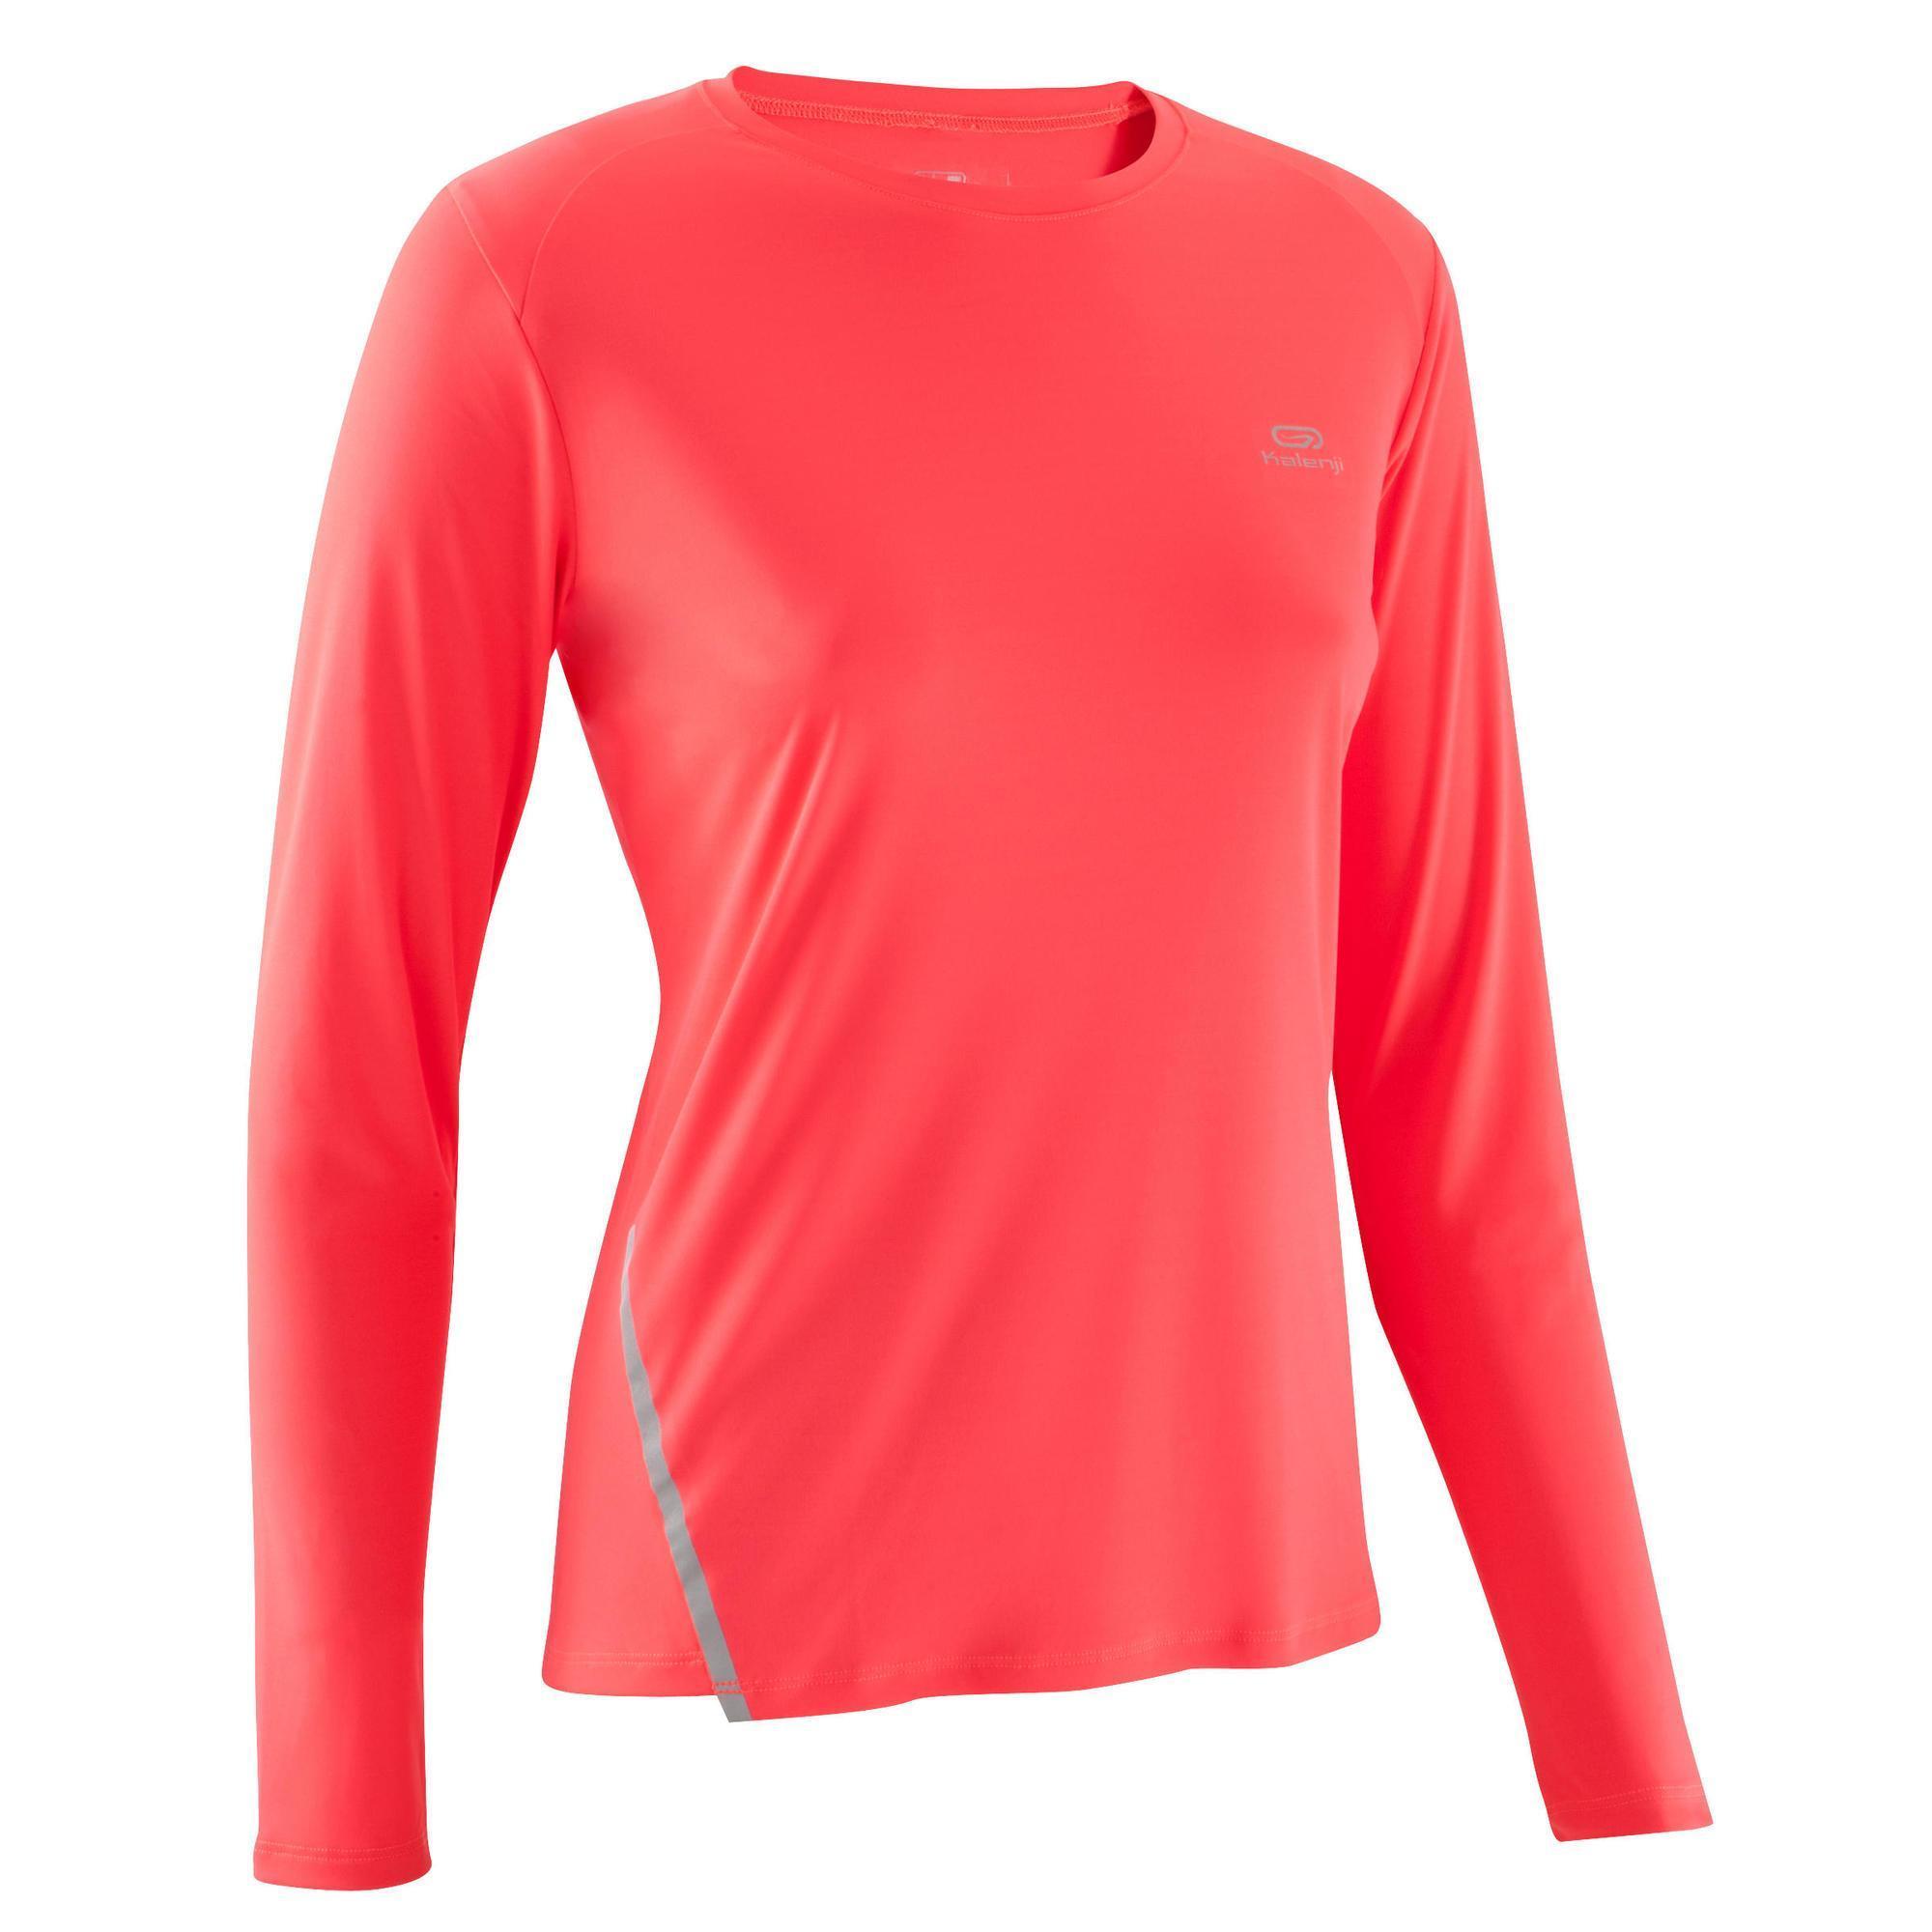 Kalenji Damesshirt met lange mouwen voor jogging Run Sun Protect